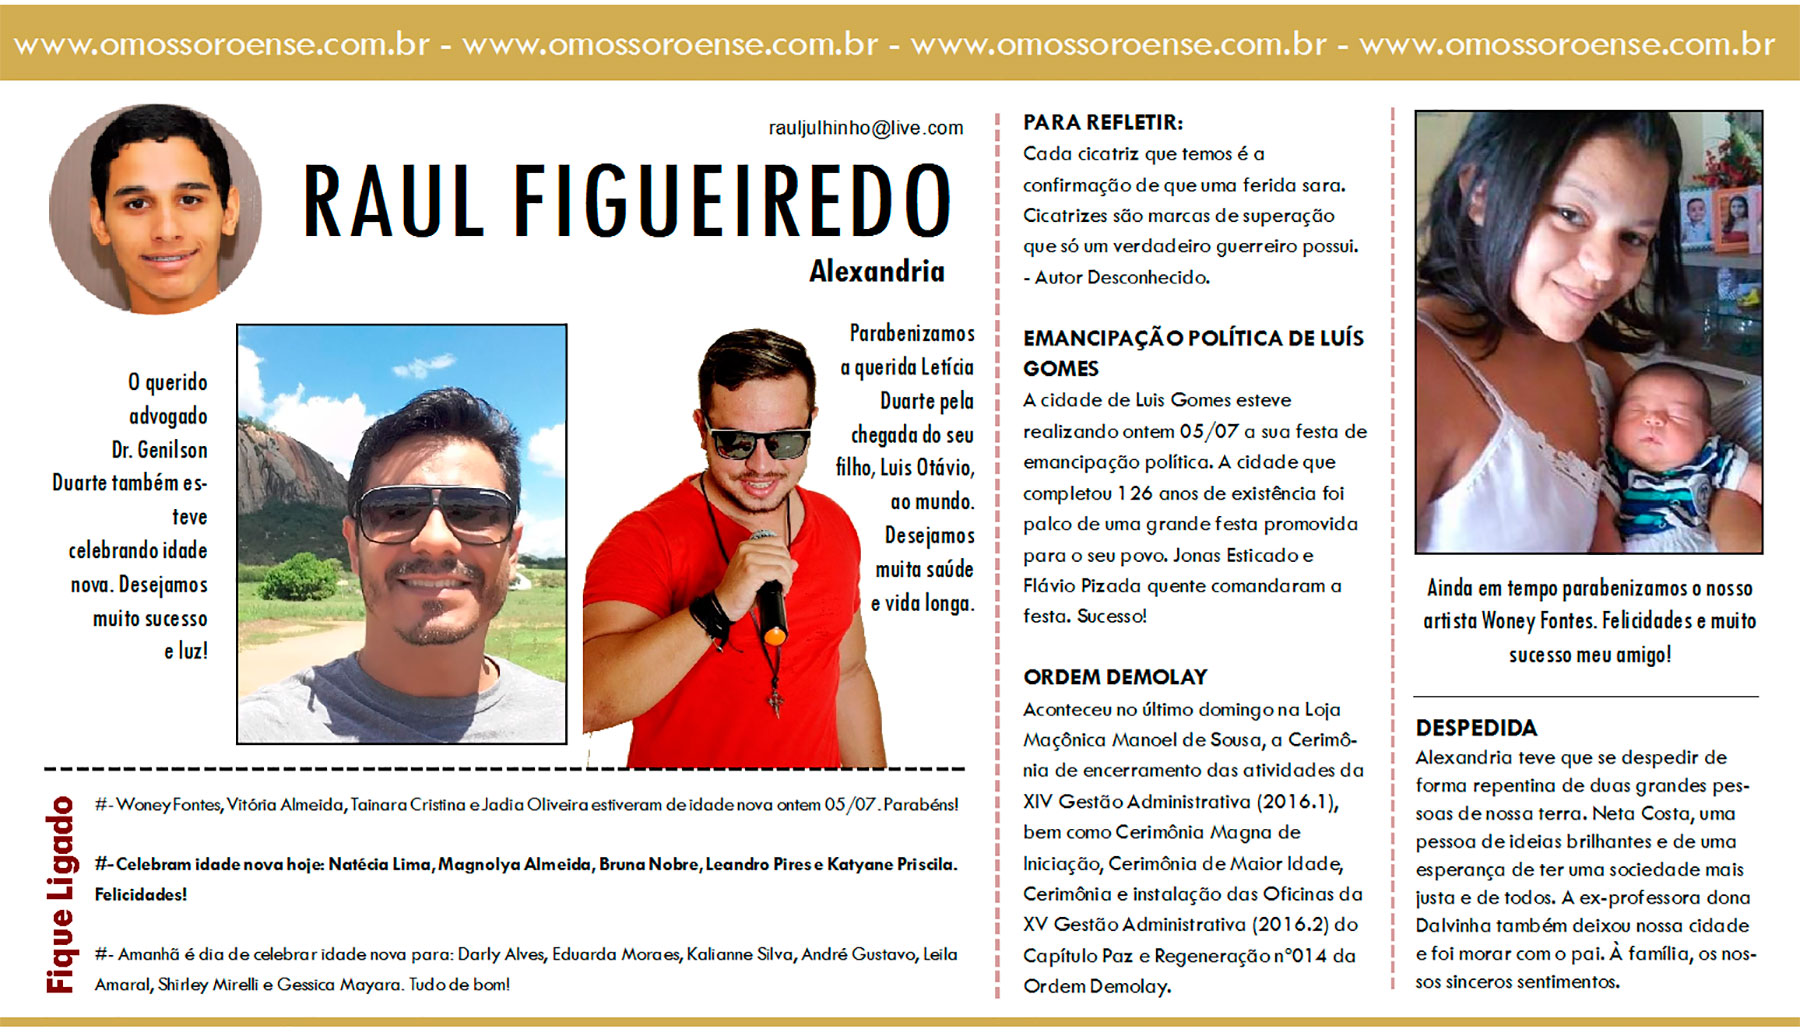 RAUL-FIGUEIREDO---05-07-2016